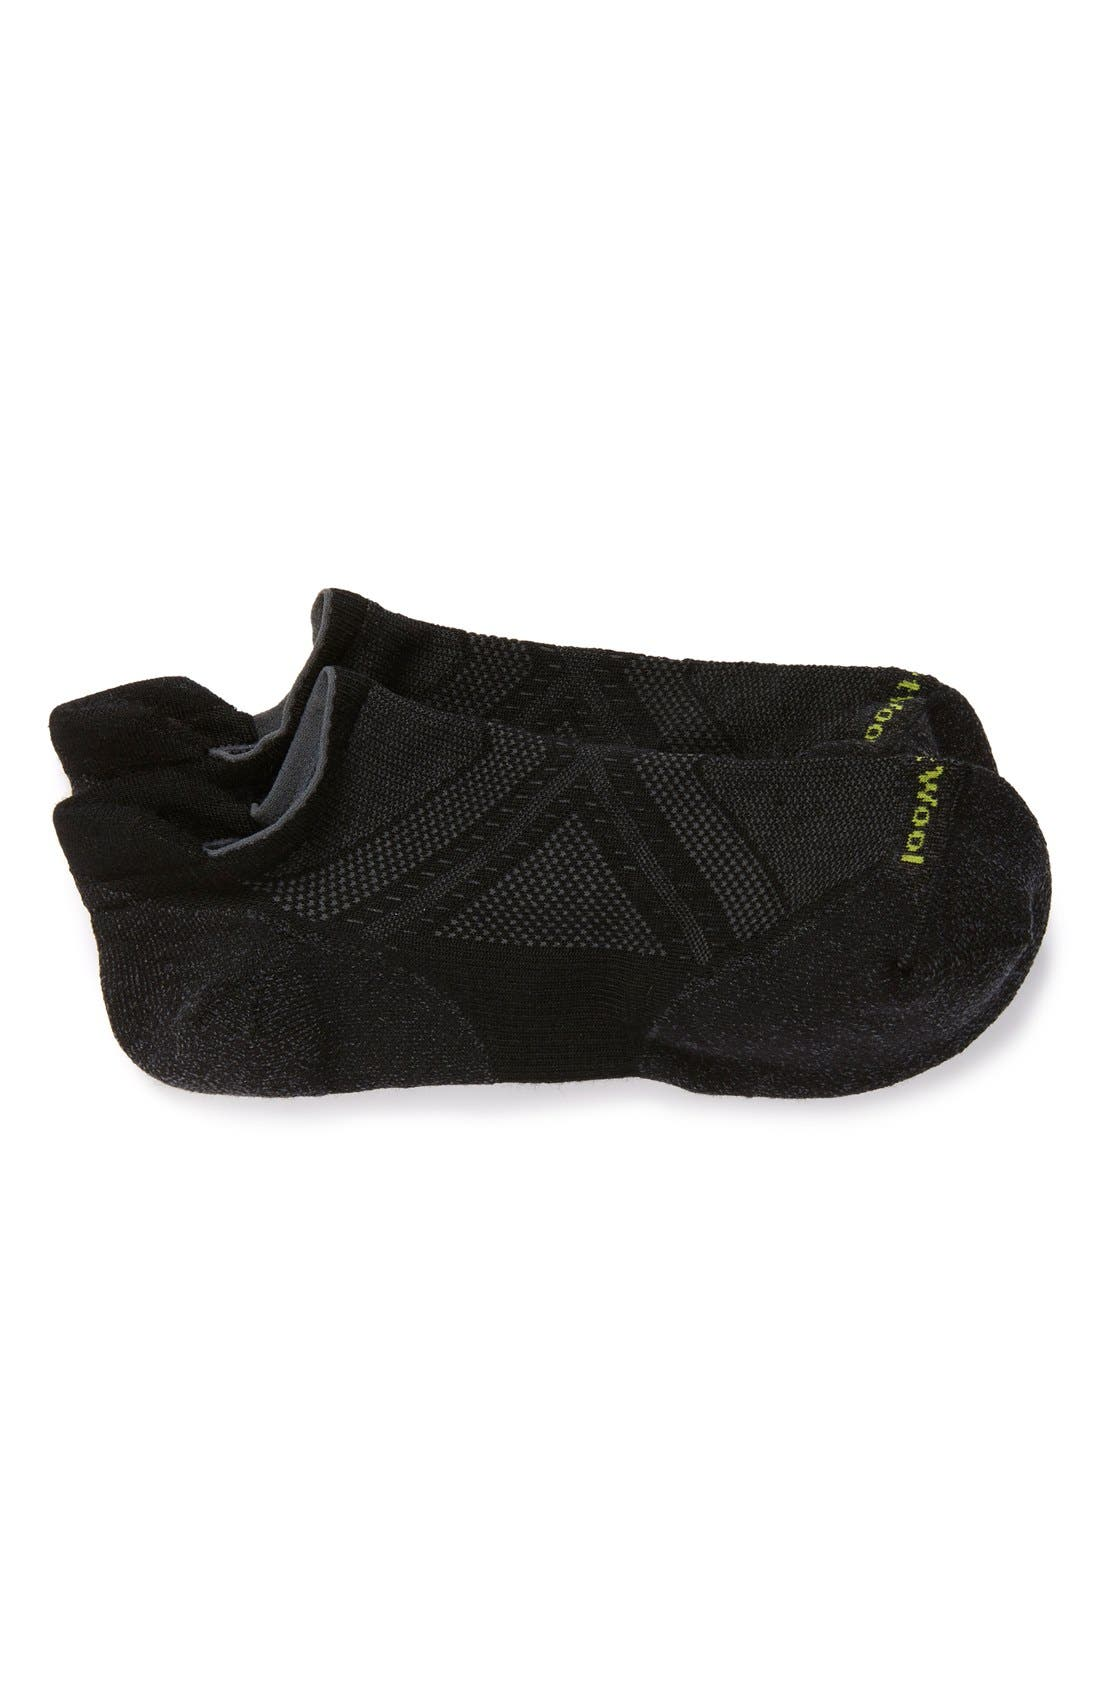 SMARTWOOL 'PhD Run Light Elite Micro' Socks, Main, color, BLACK